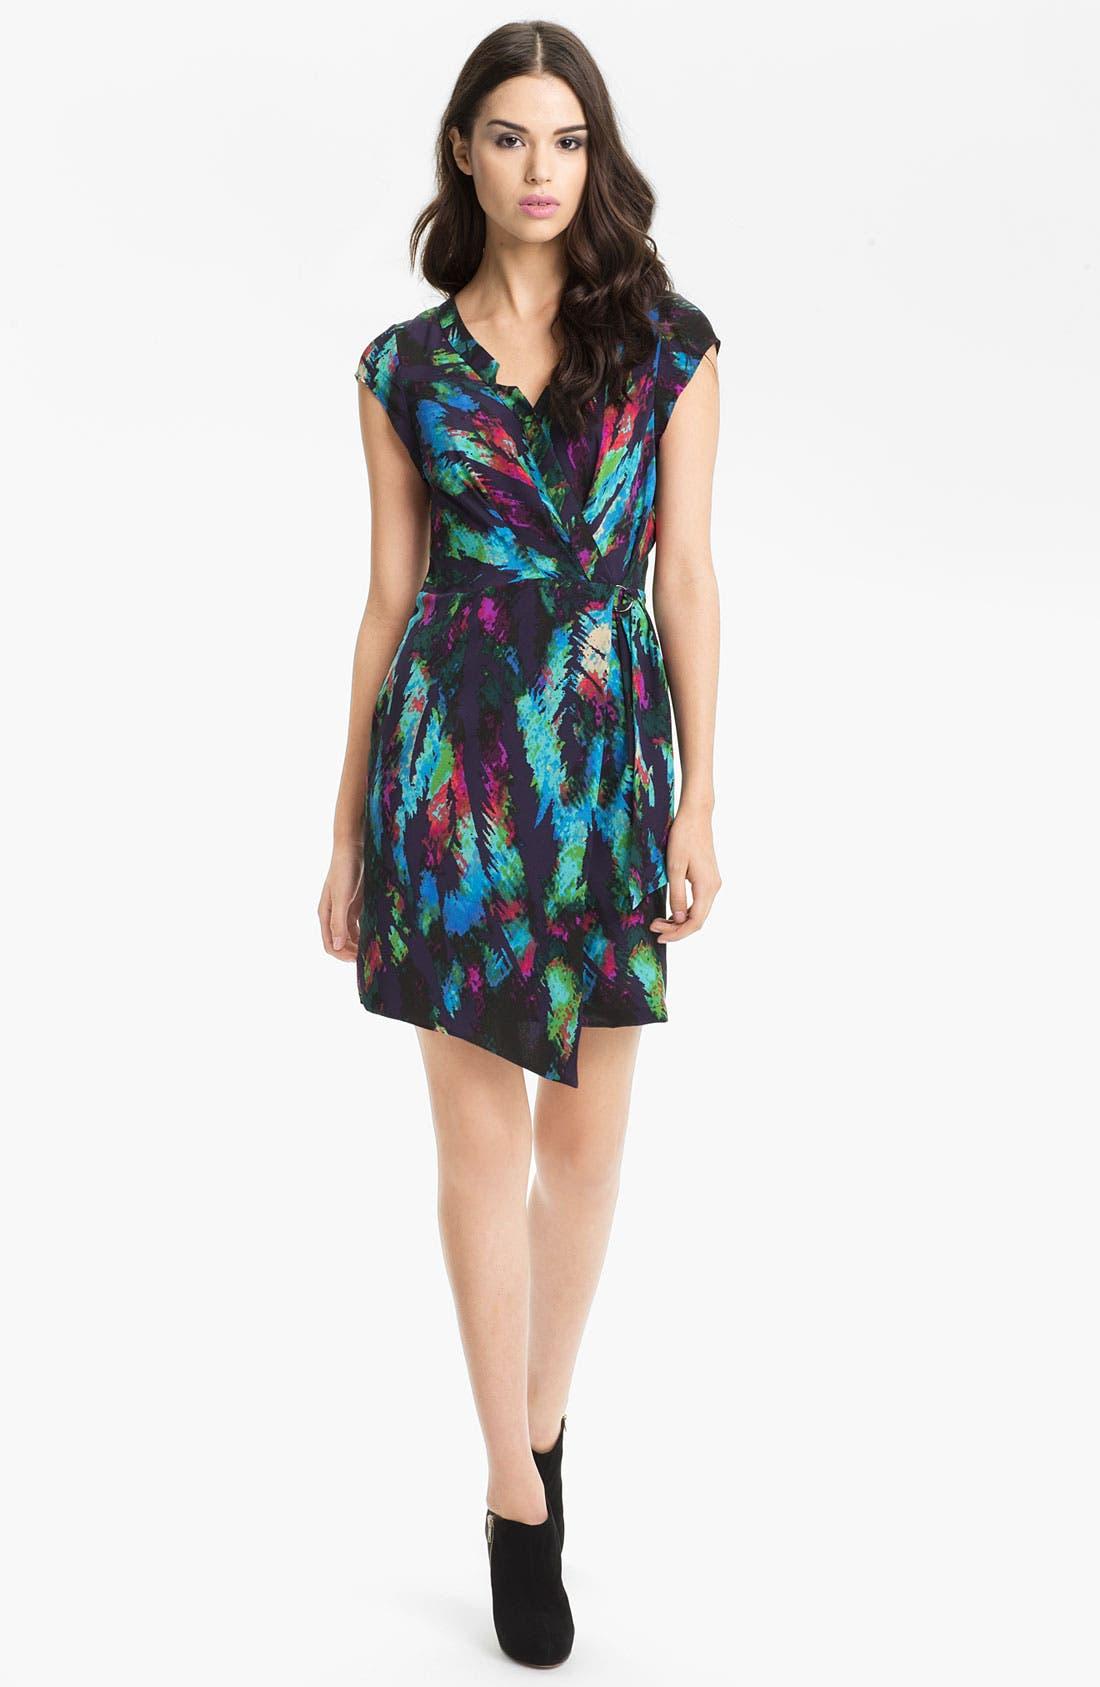 Alternate Image 1 Selected - Presley Skye 'Hannah' Print Faux Wrap Silk Dress